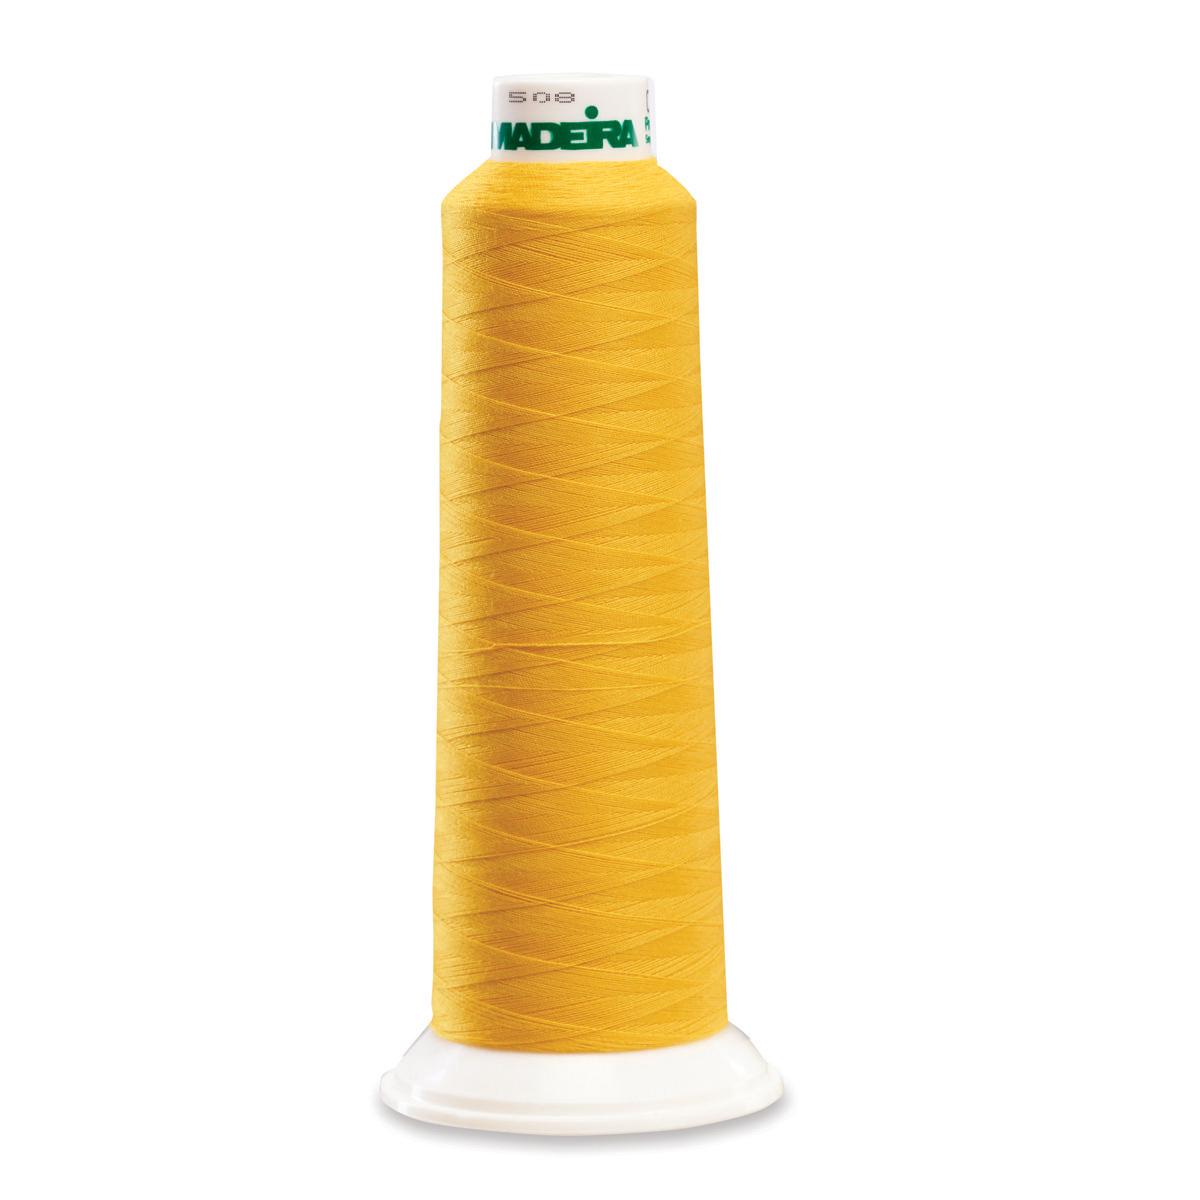 9951 Mustard Poly Serger Thread Madeira Aerolock